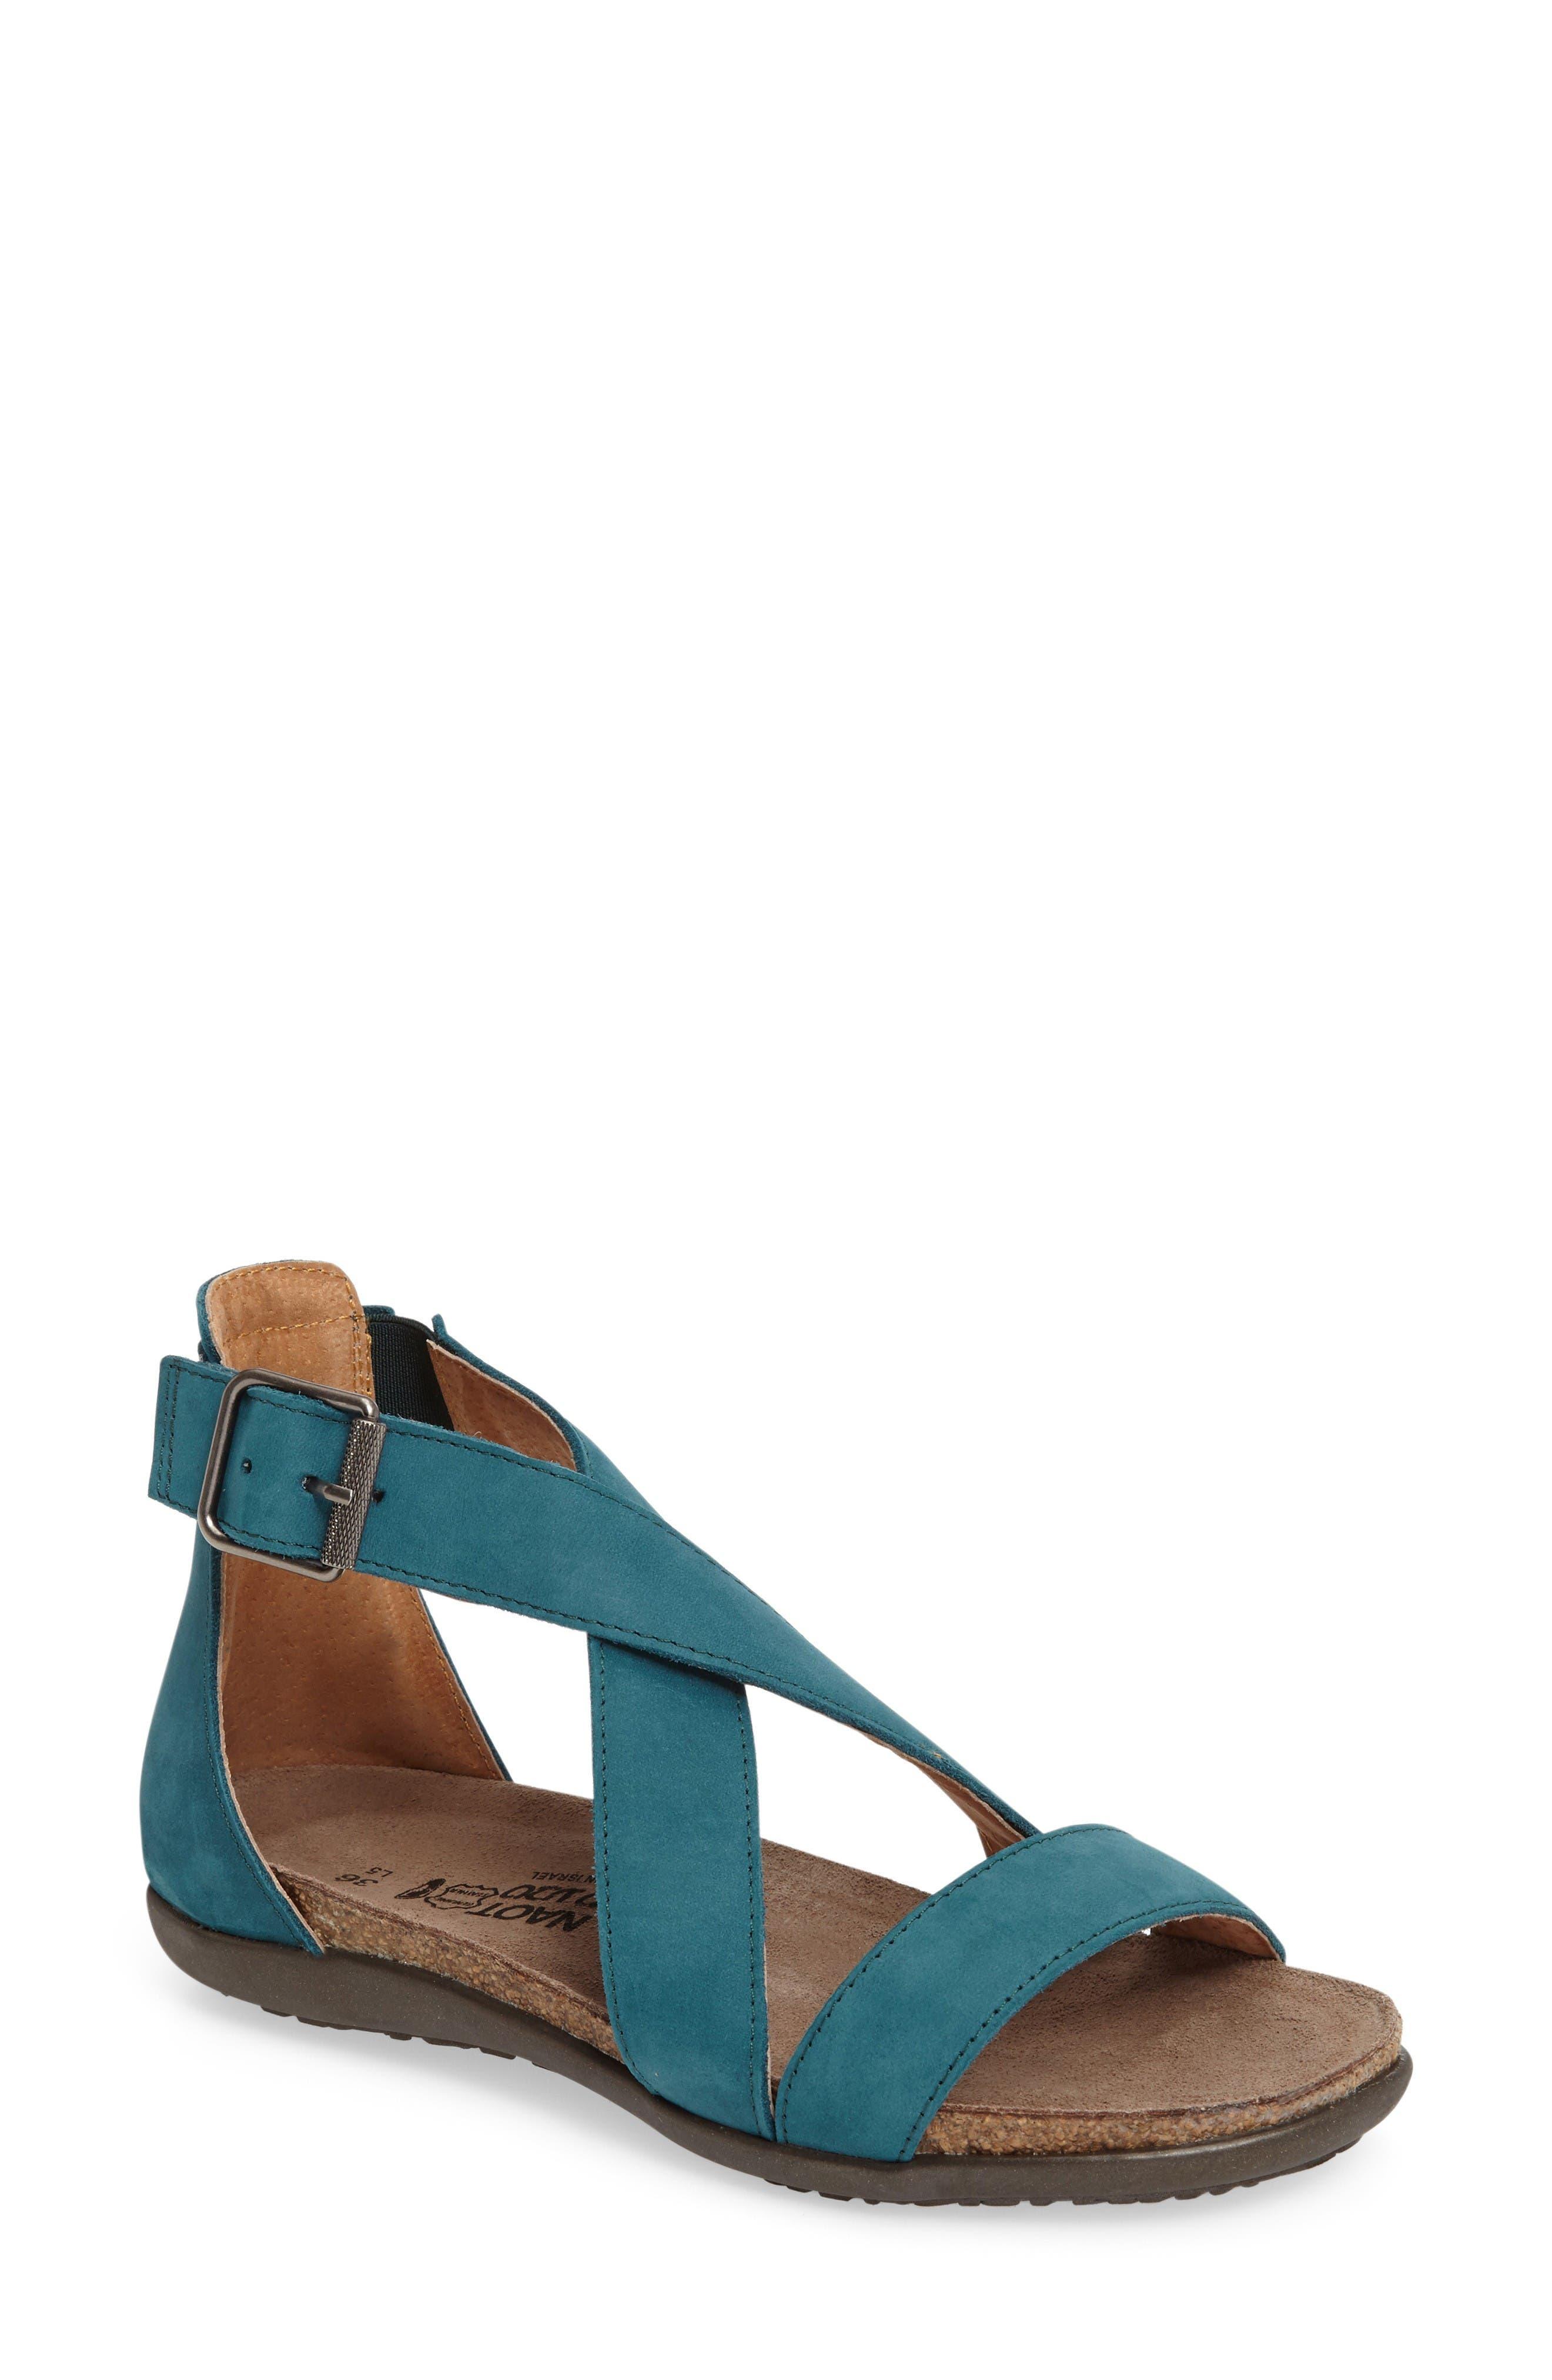 Alternate Image 1 Selected - Naot Rianna Crisscross Sandal (Women)